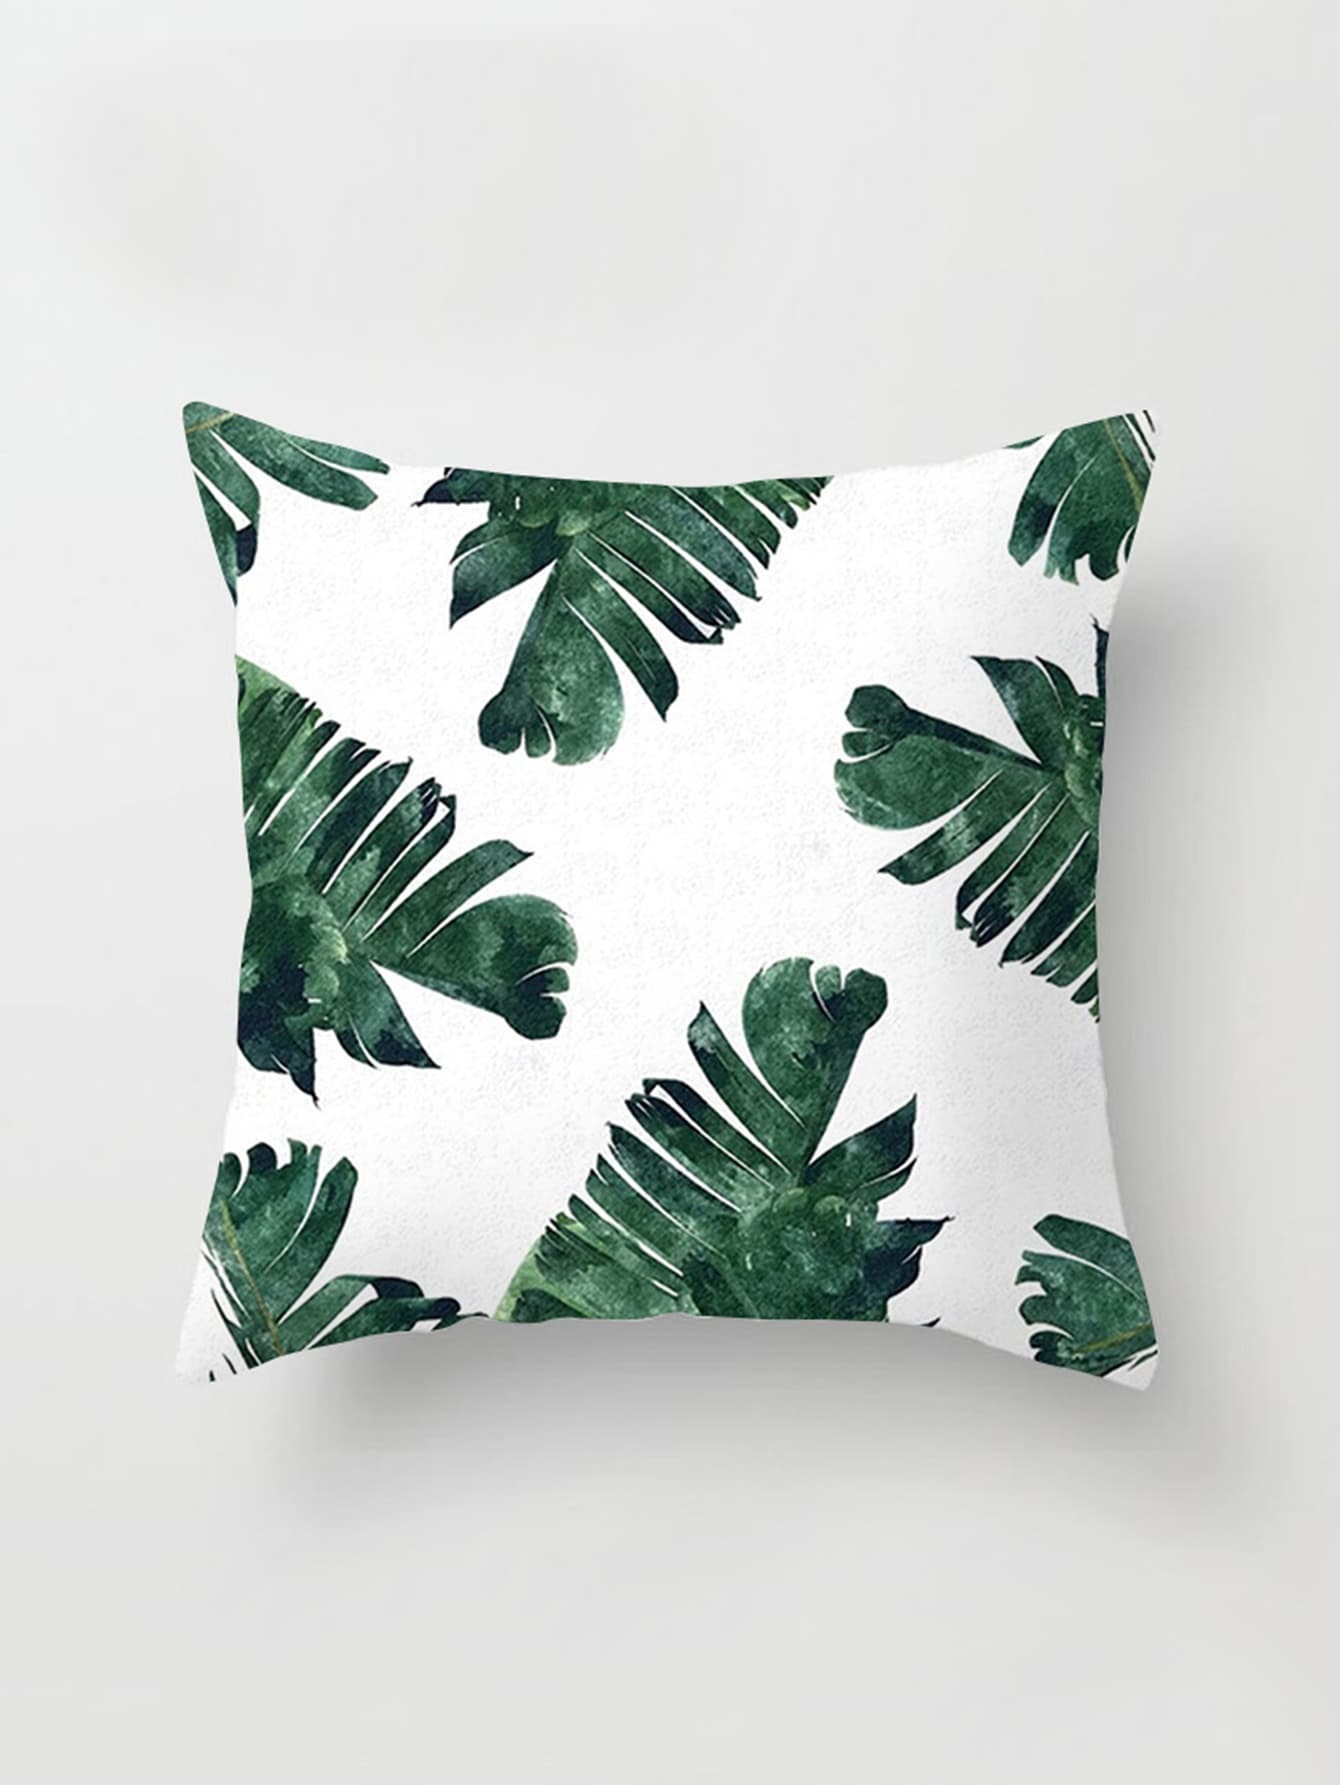 Jungle Print Pillowcase Cover